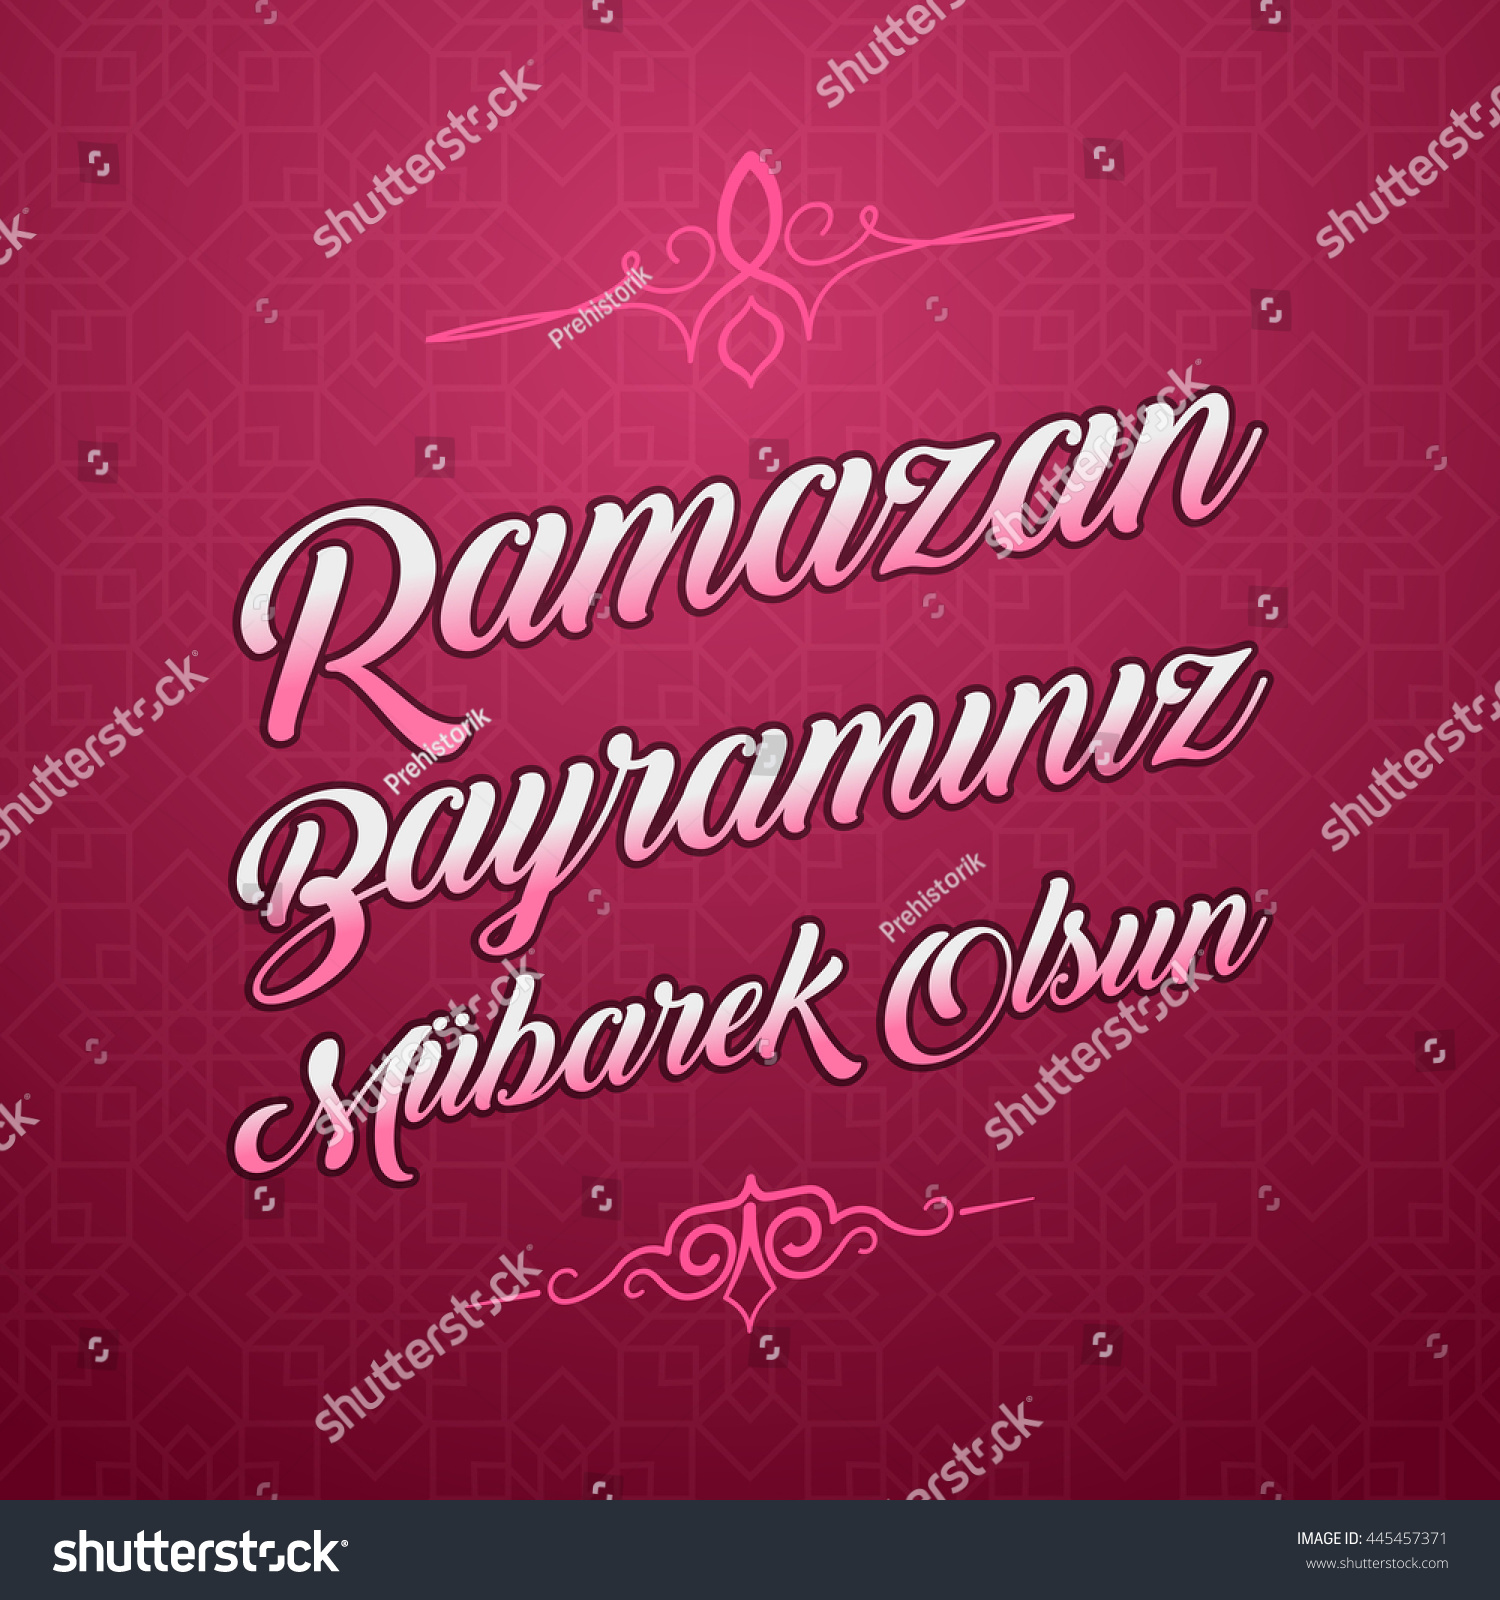 Feast of Ramadan and Candy Ramadan and Candy Festival Greeting Turkish Ramazan Bayraminiz Mubarek Olsun Vector Elements and Background